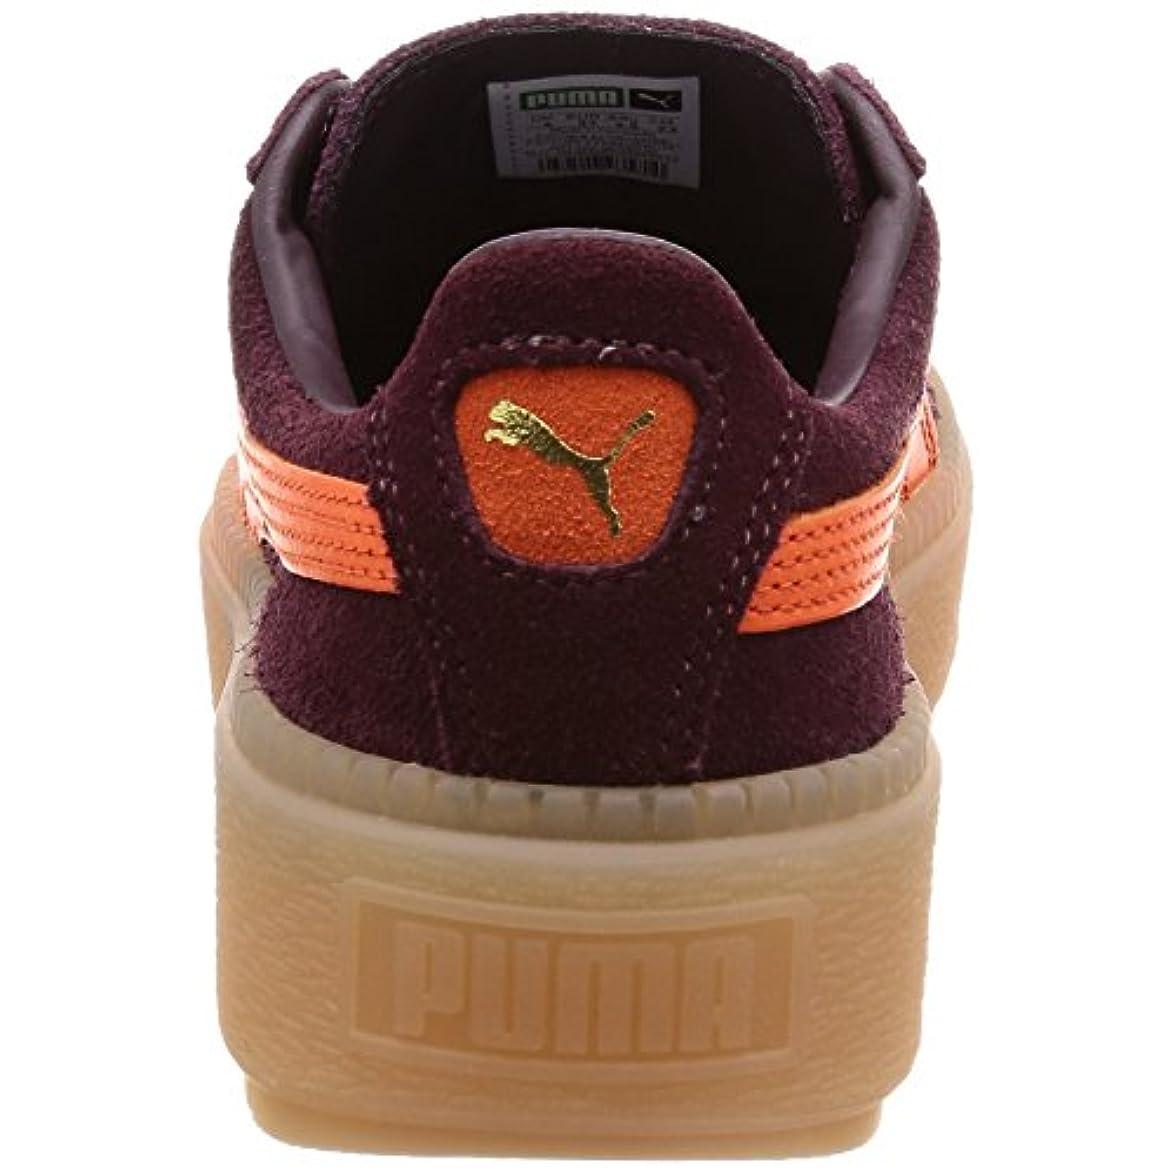 Puma Sneakers Trace Bordeaux E Arancio